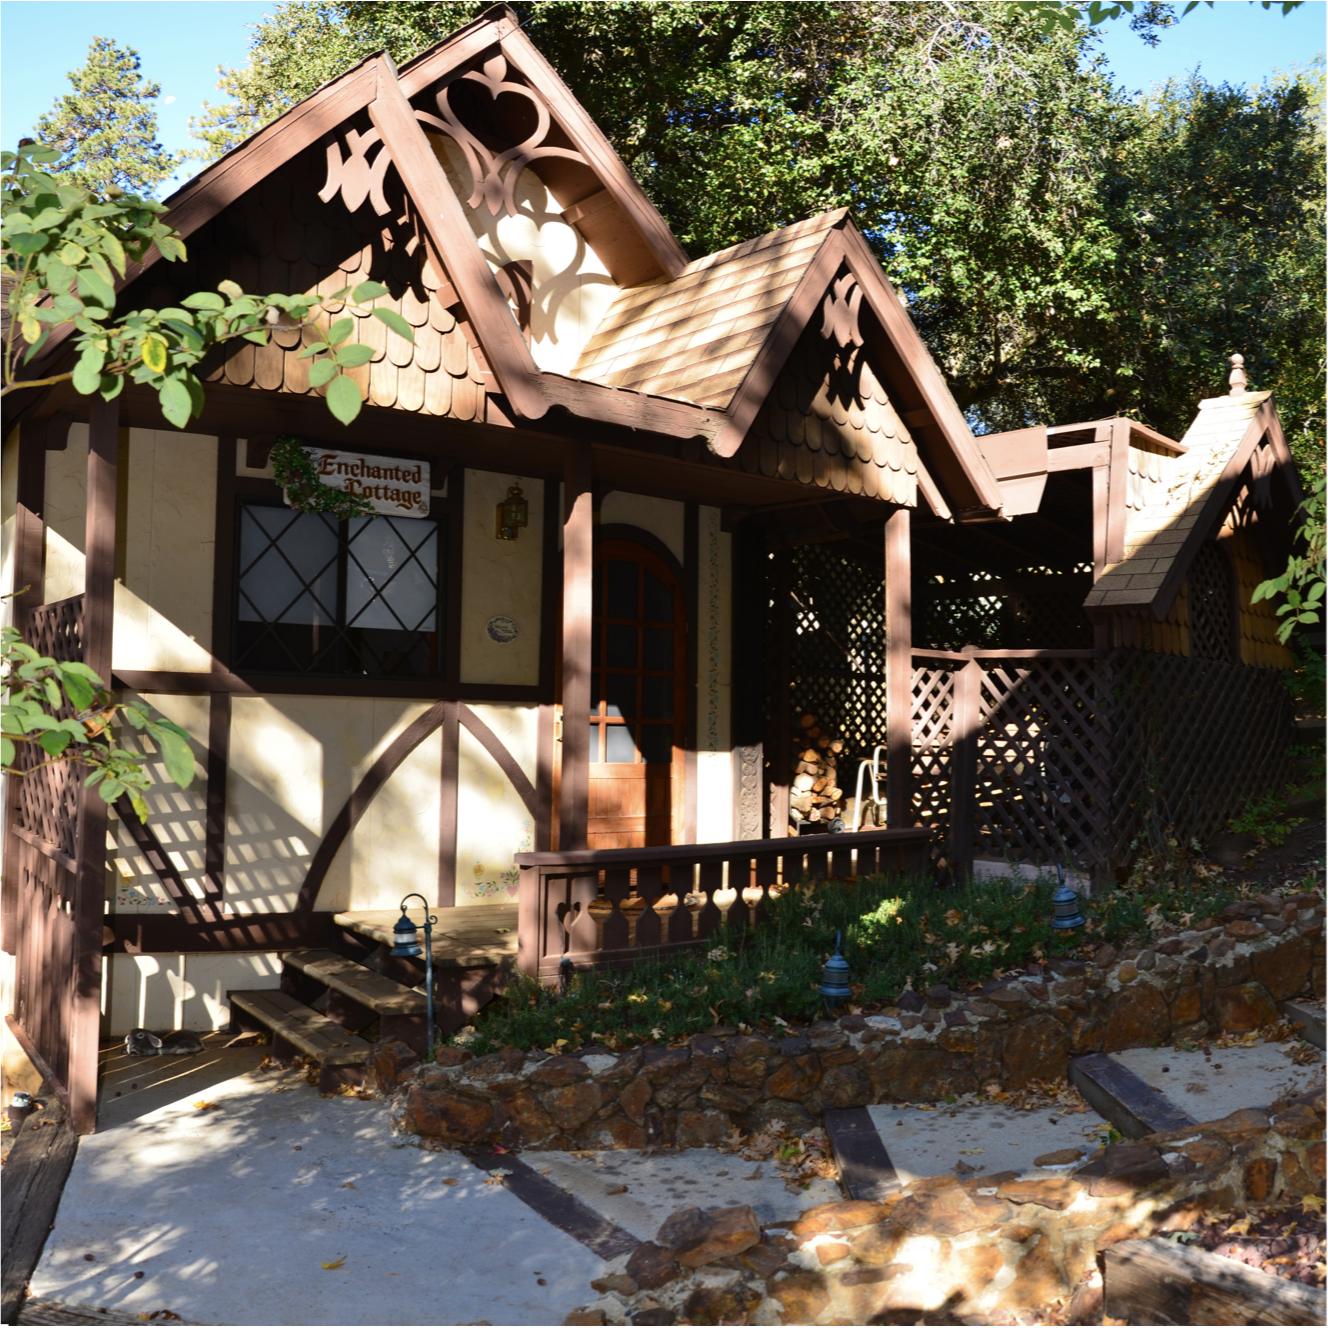 Enchanted Cottage -